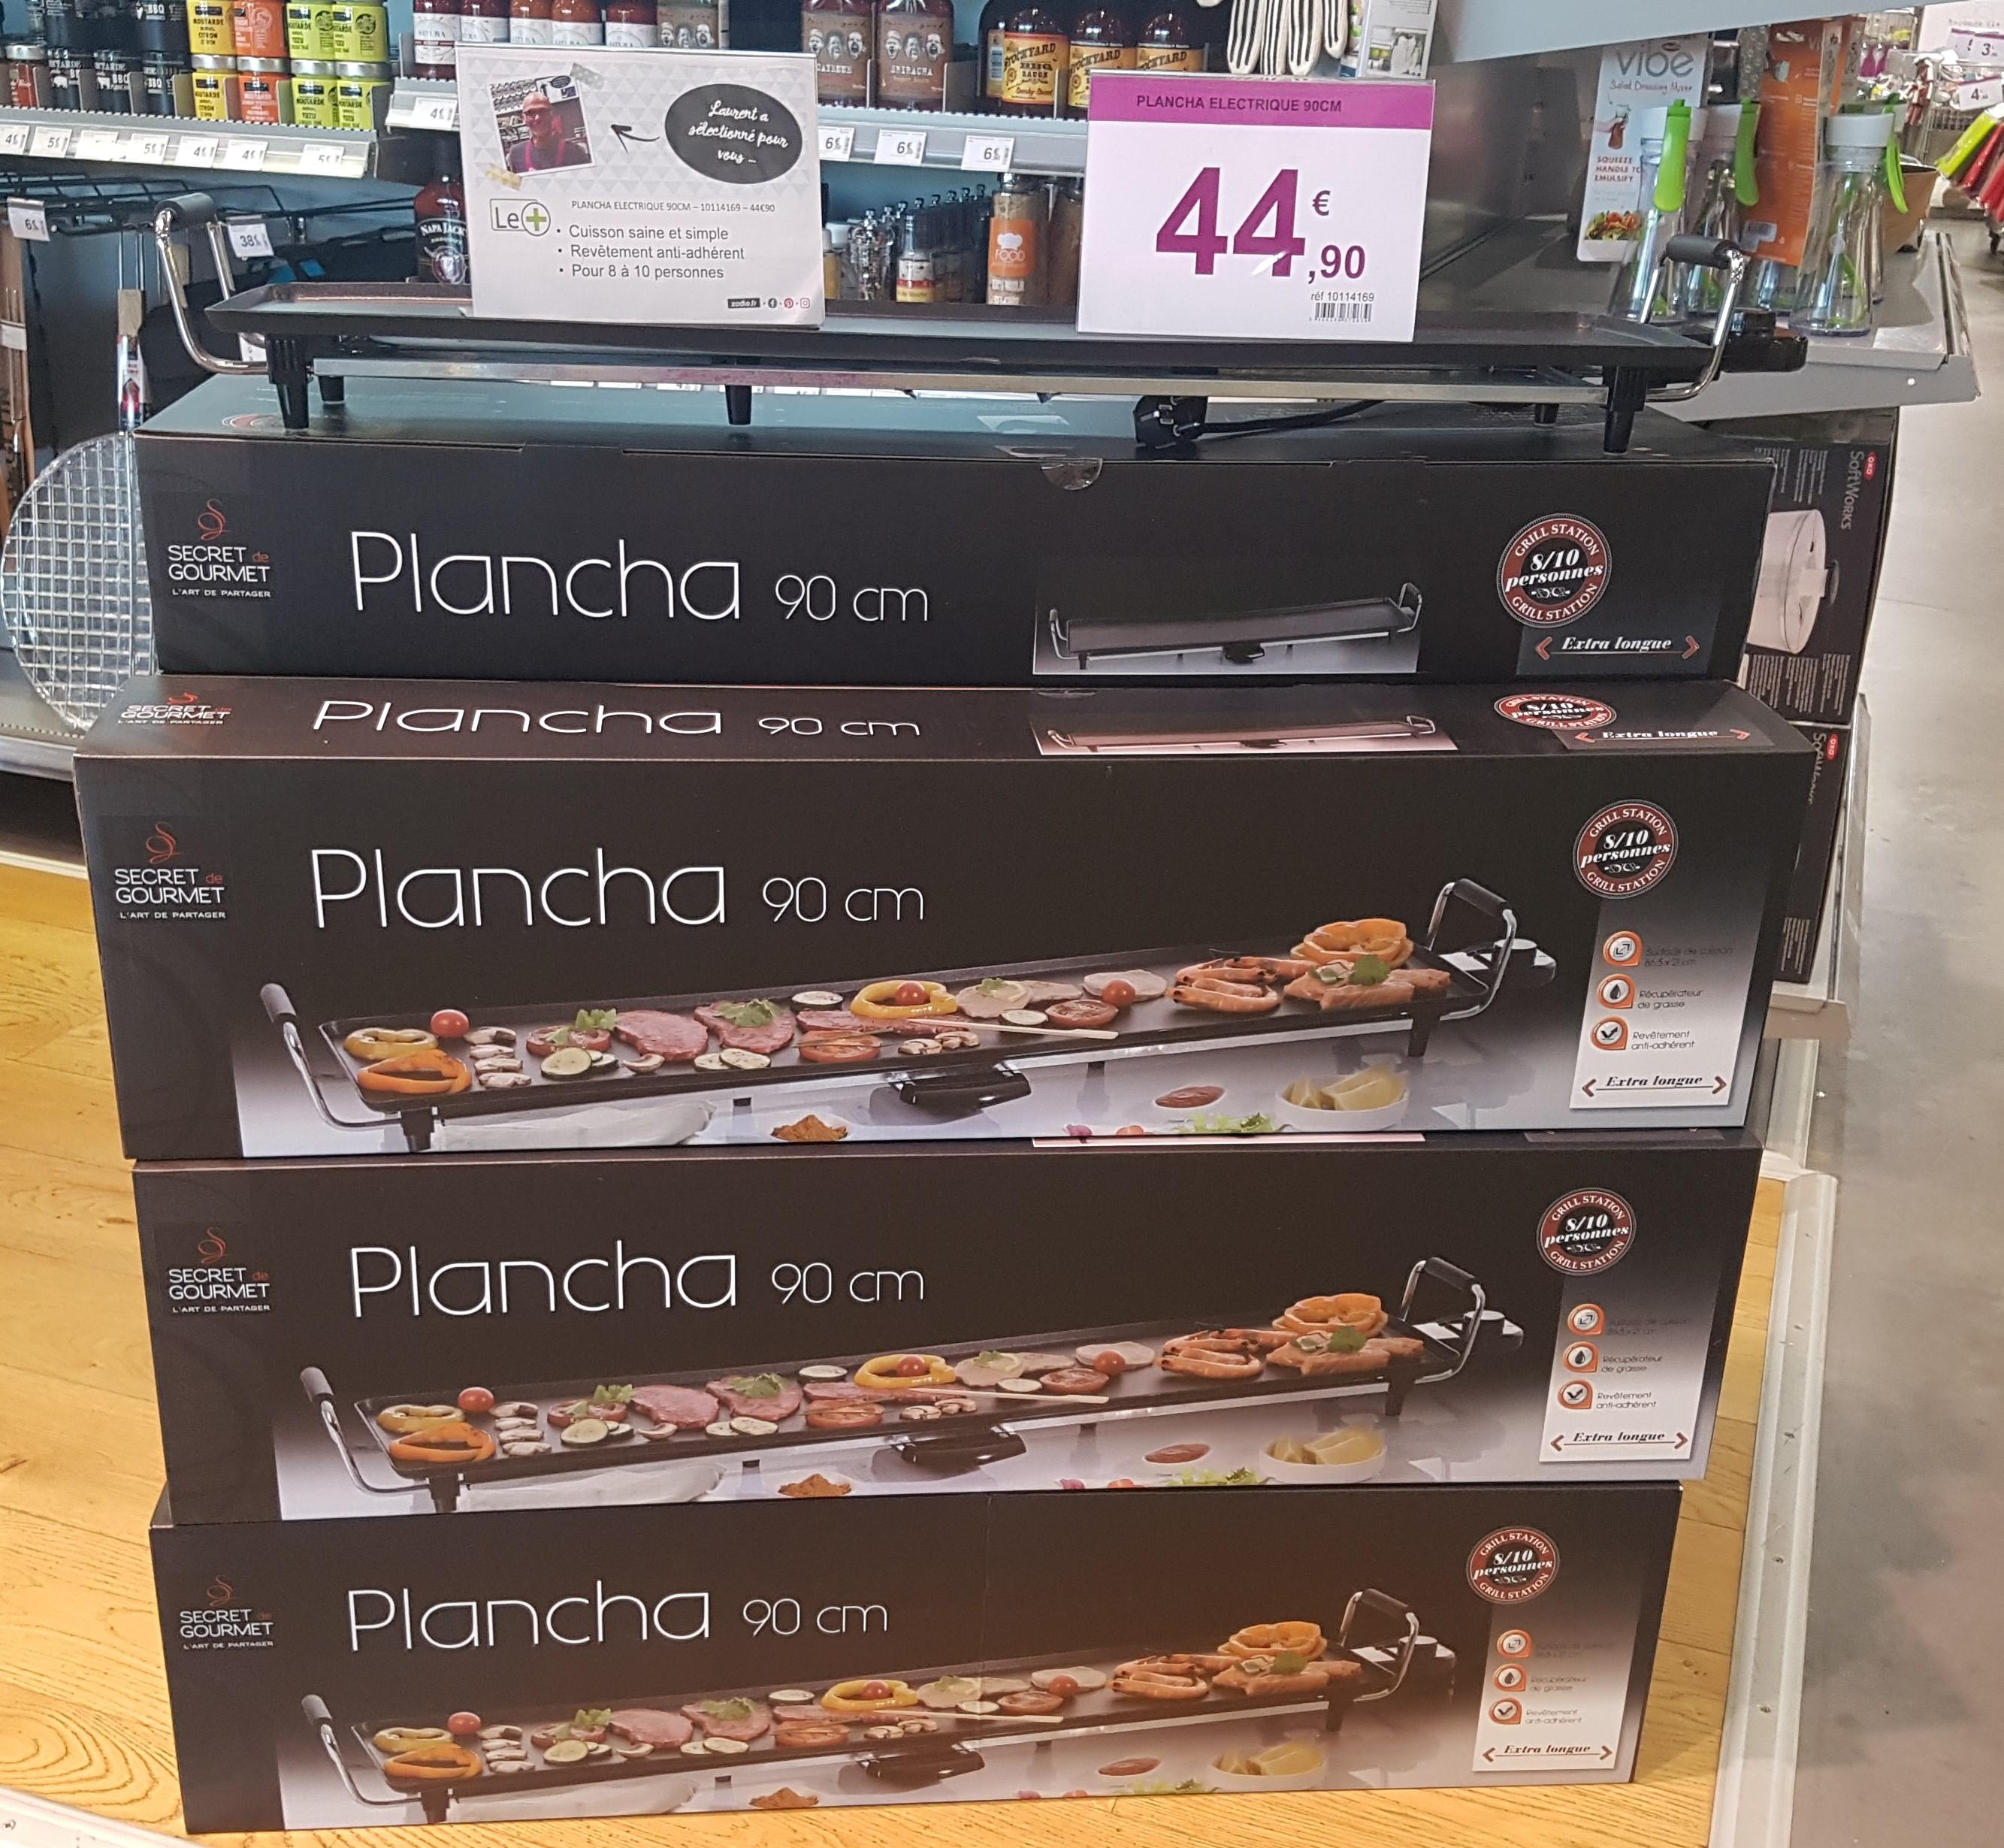 Plancha secret gourmet